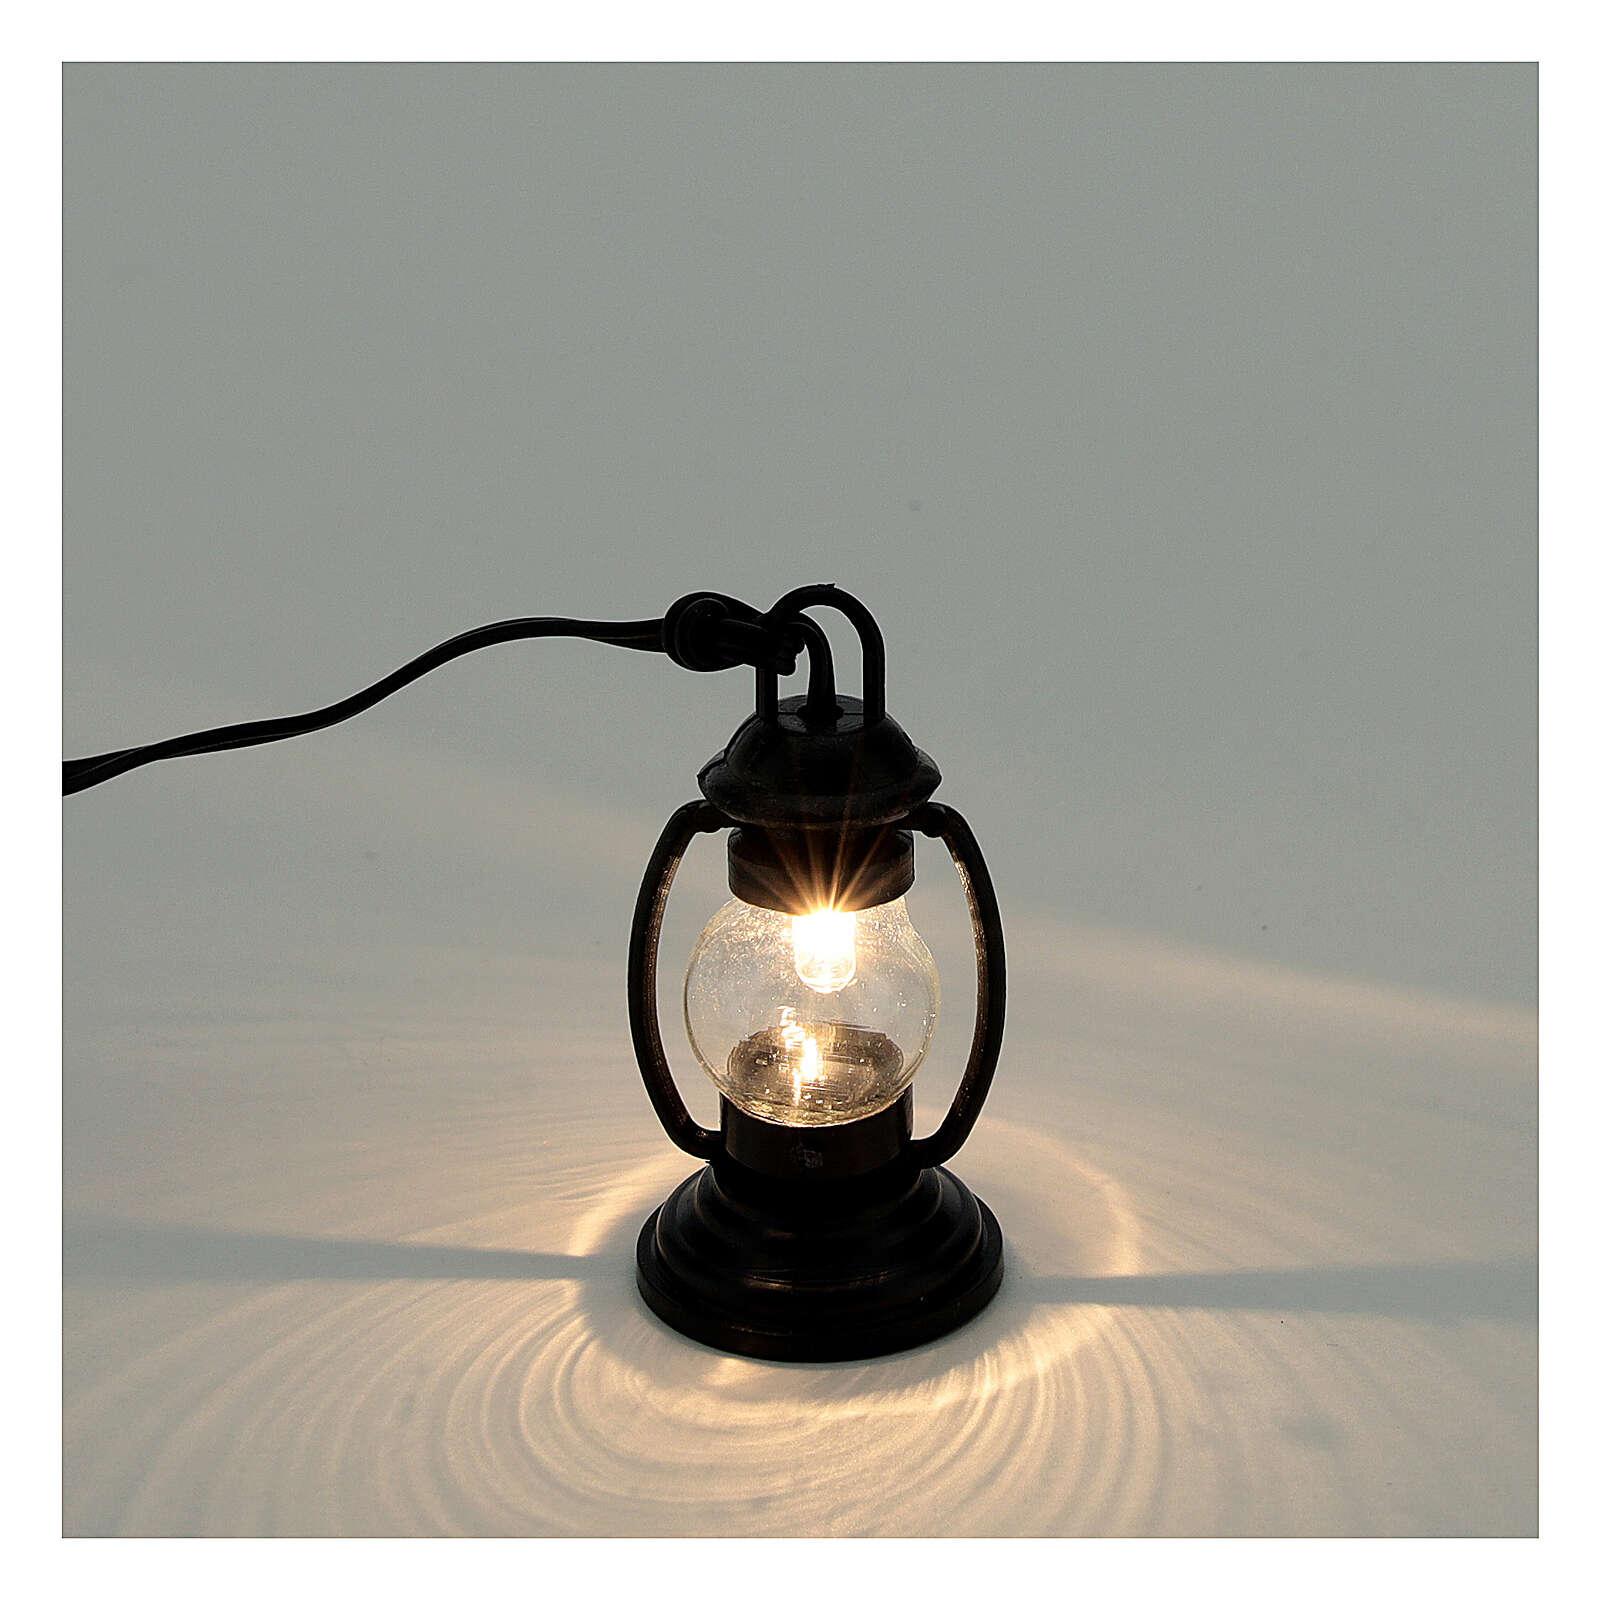 Lanterna presepe 8-10 cm luce bianca 3,5V h 4 cm 4